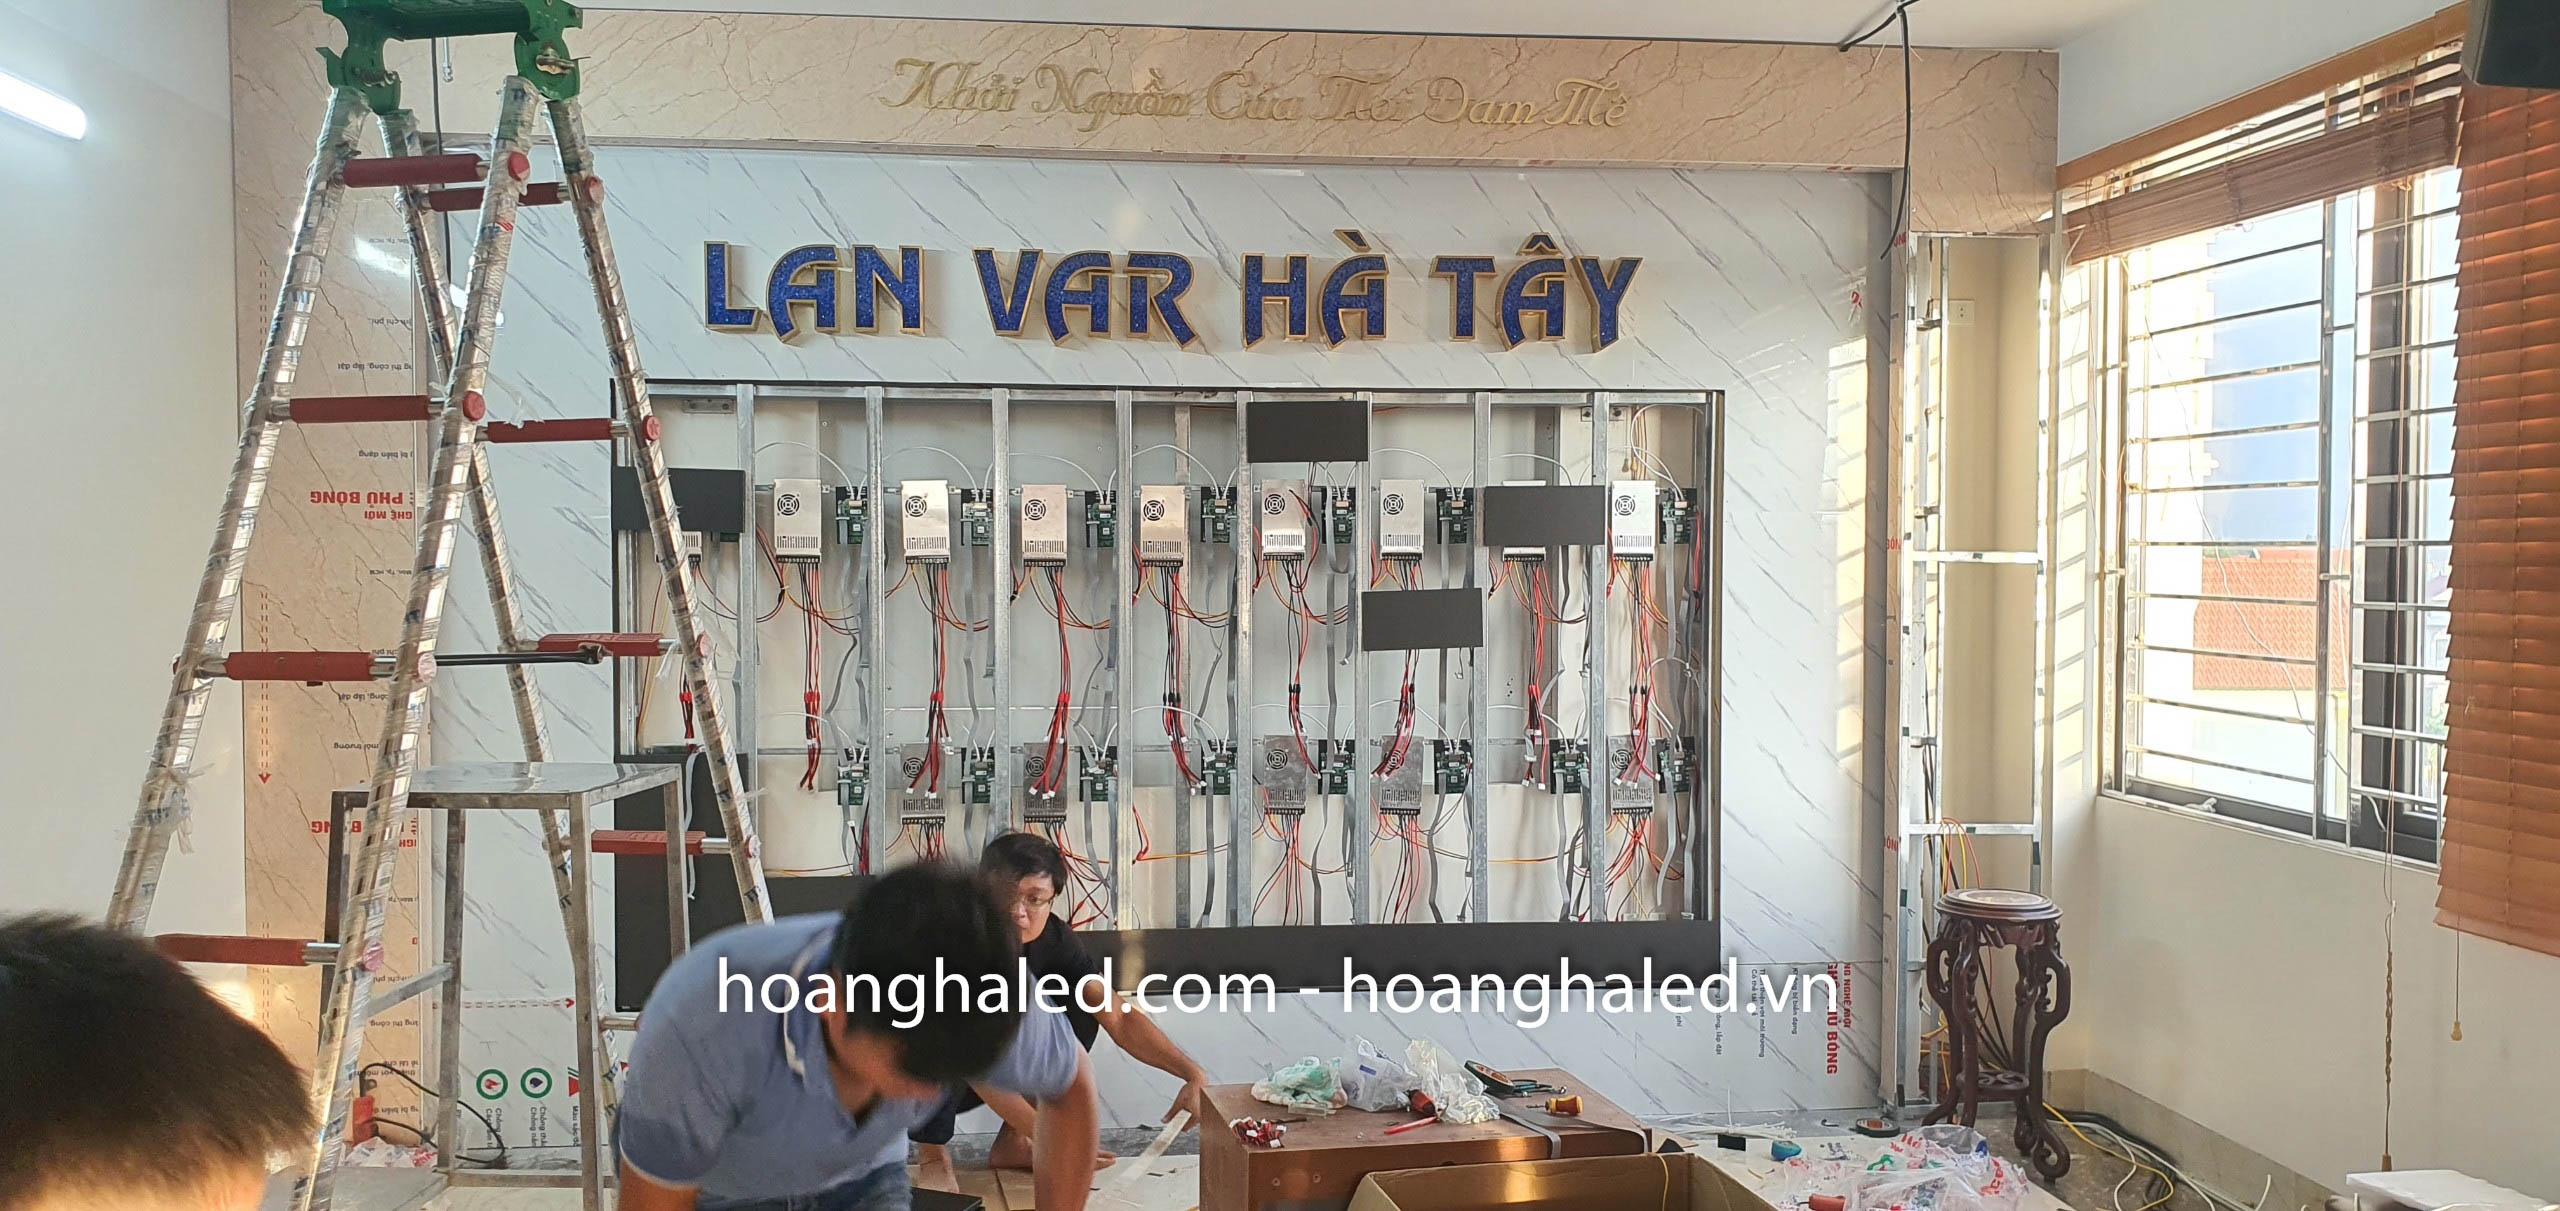 man_hinh_led_p2_trong_nha_tai_lan_var_ha_tay_2